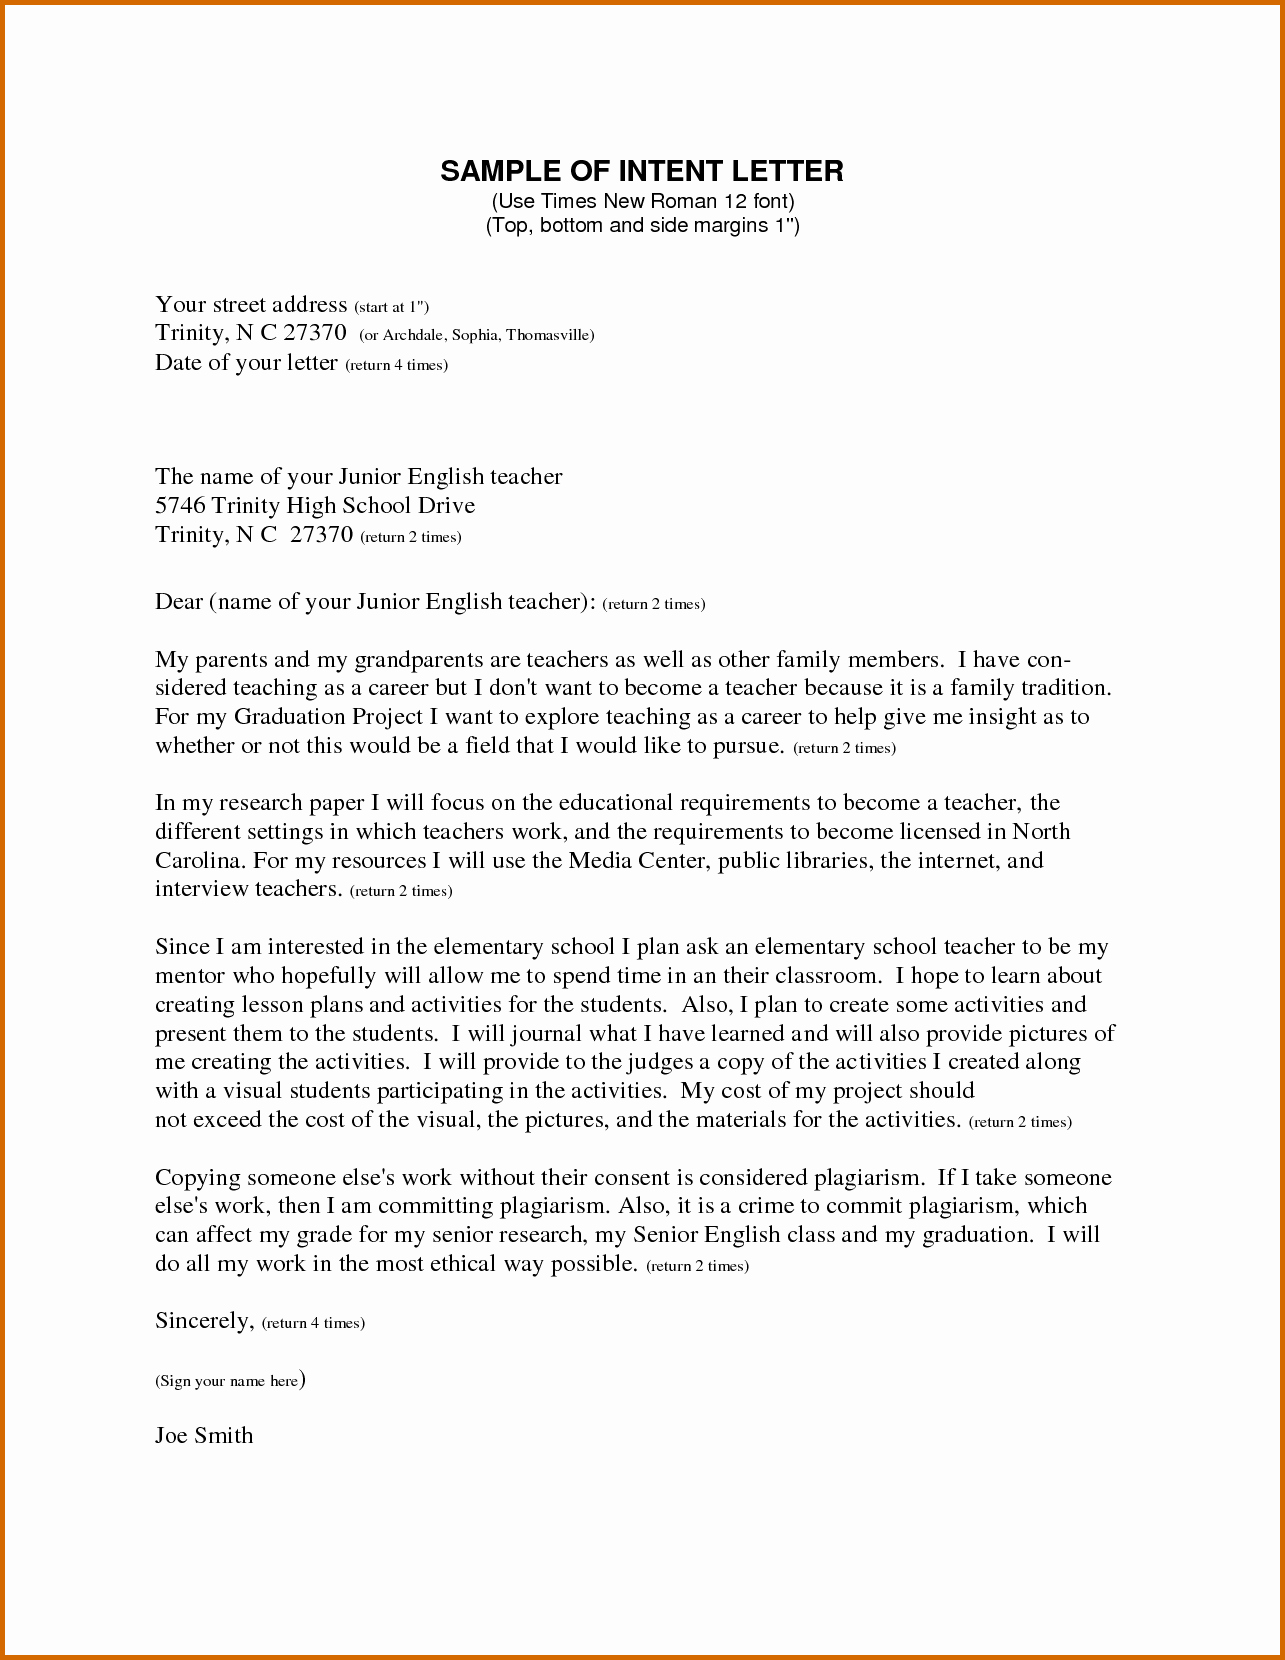 Intent Letter format